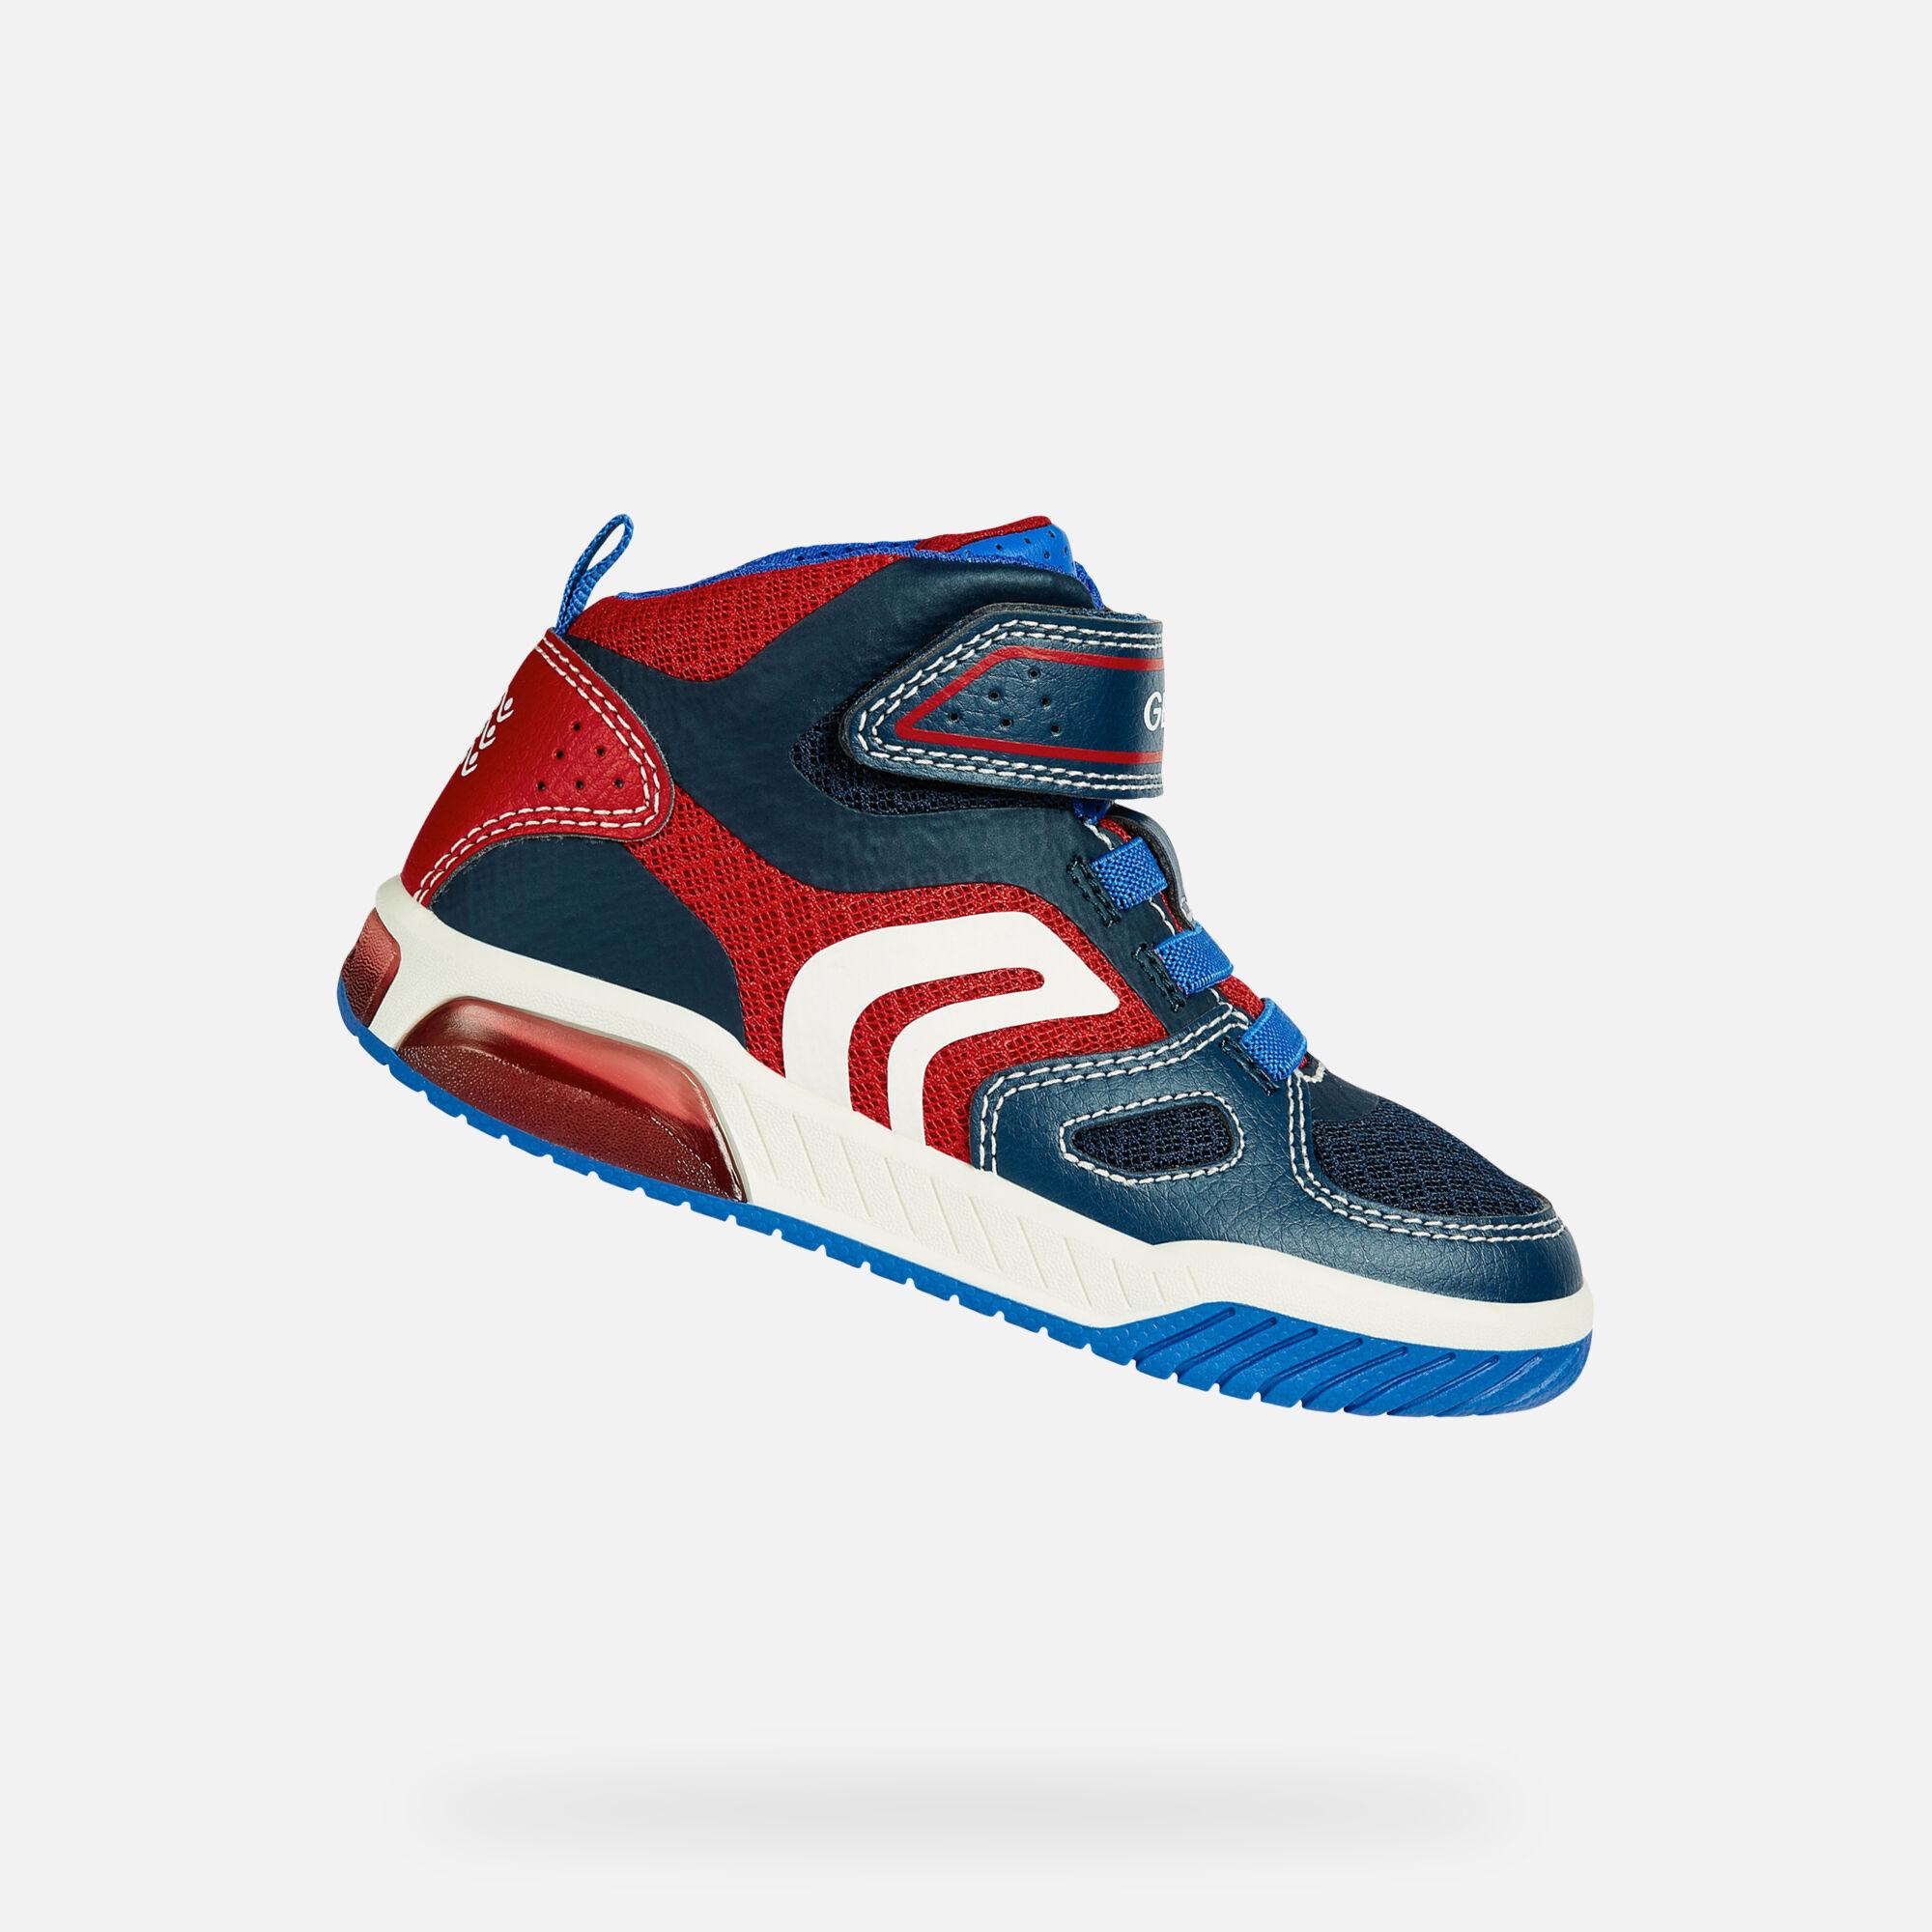 Scarpe 45999022 U Sandford A Nuovo Geox Uomo Sneakers kOPXiZu